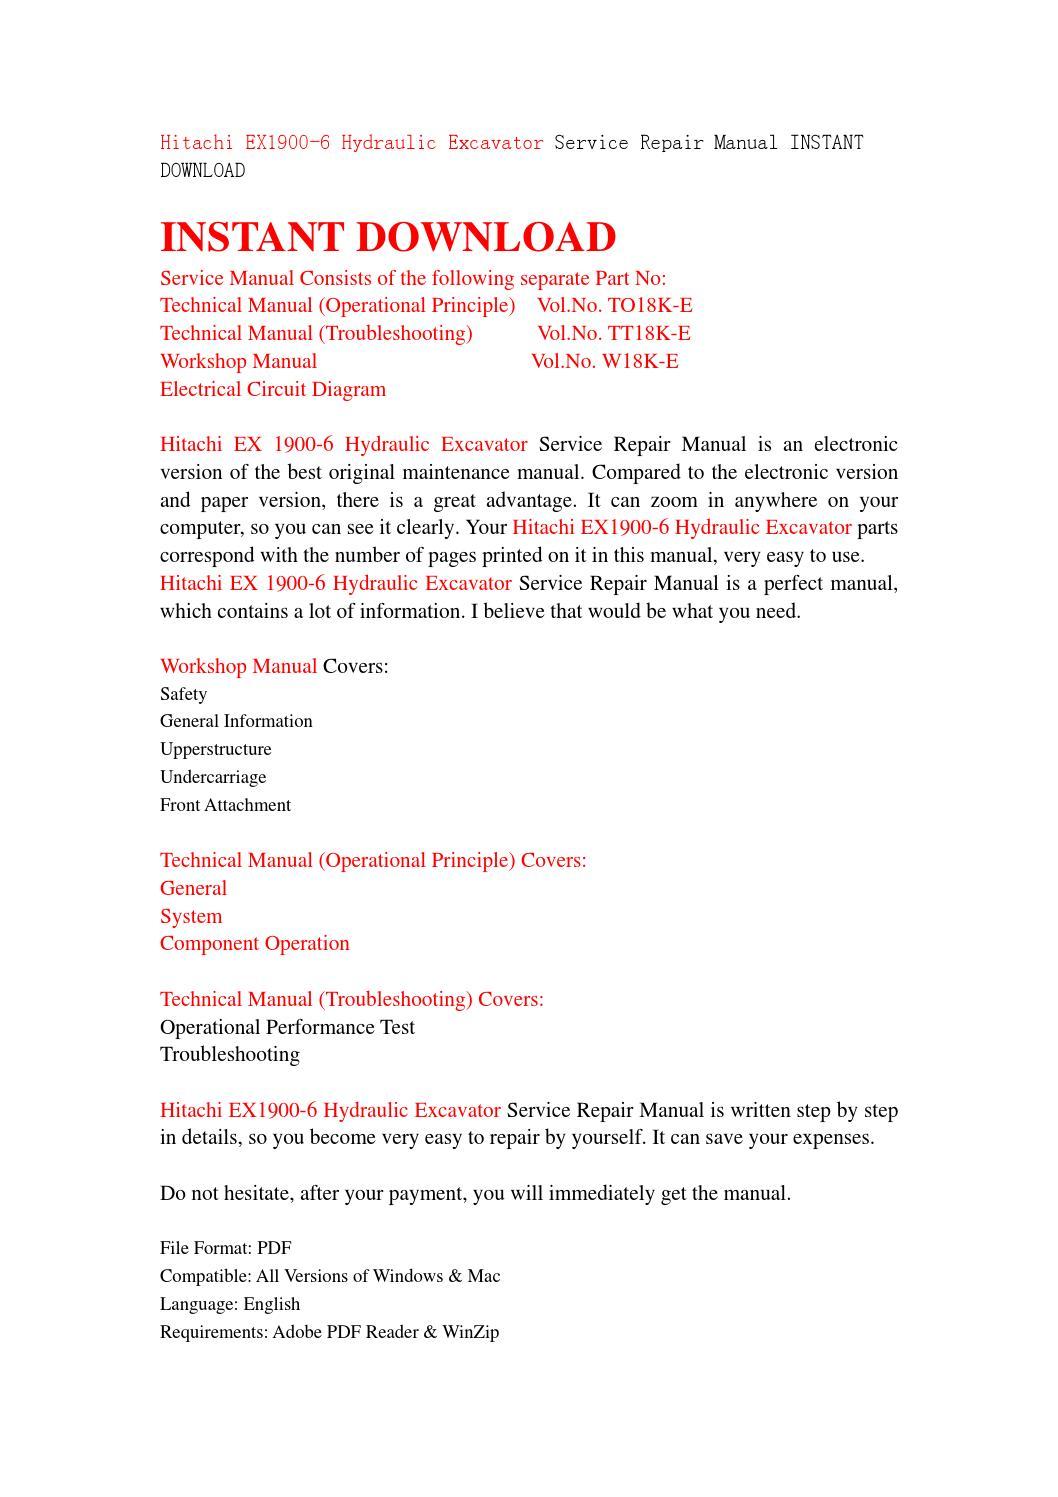 Hitachi Ex1900 6 Hydraulic Excavator Service Repair Manual Instant Electrical Circuit Diagram Mac Download By Jjfhjsnef Issuu